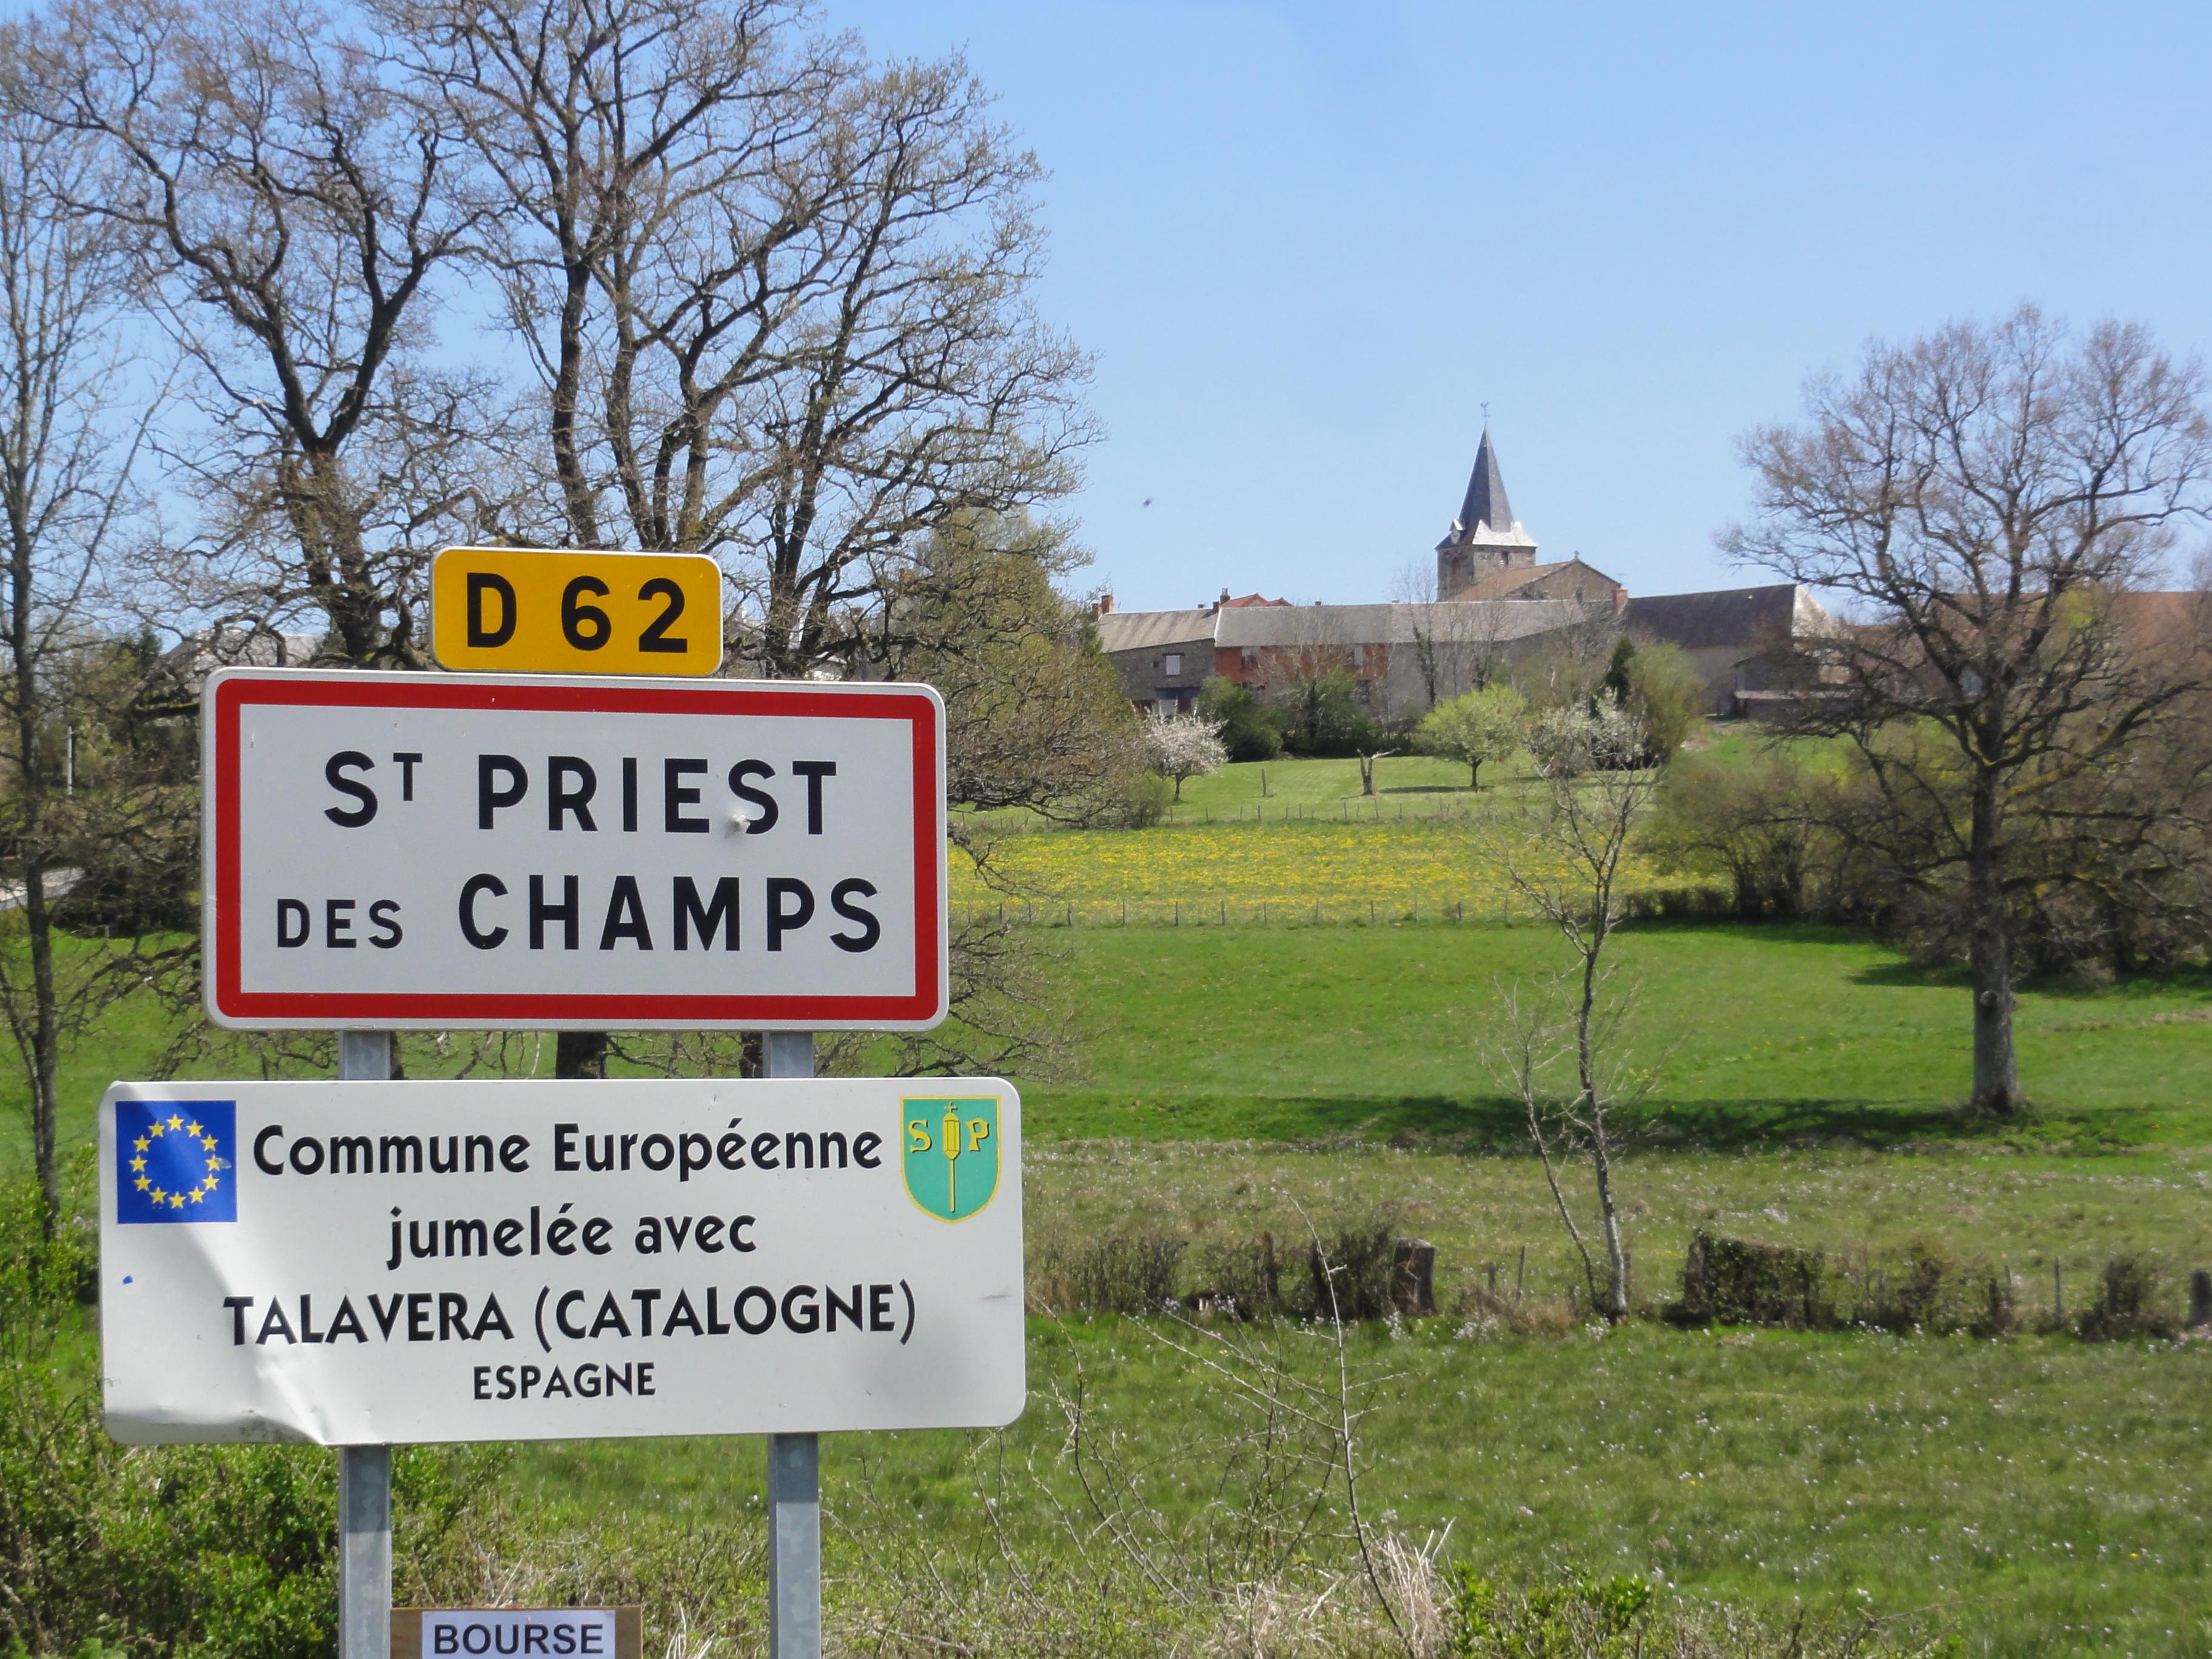 saint priest des champs wikipedia